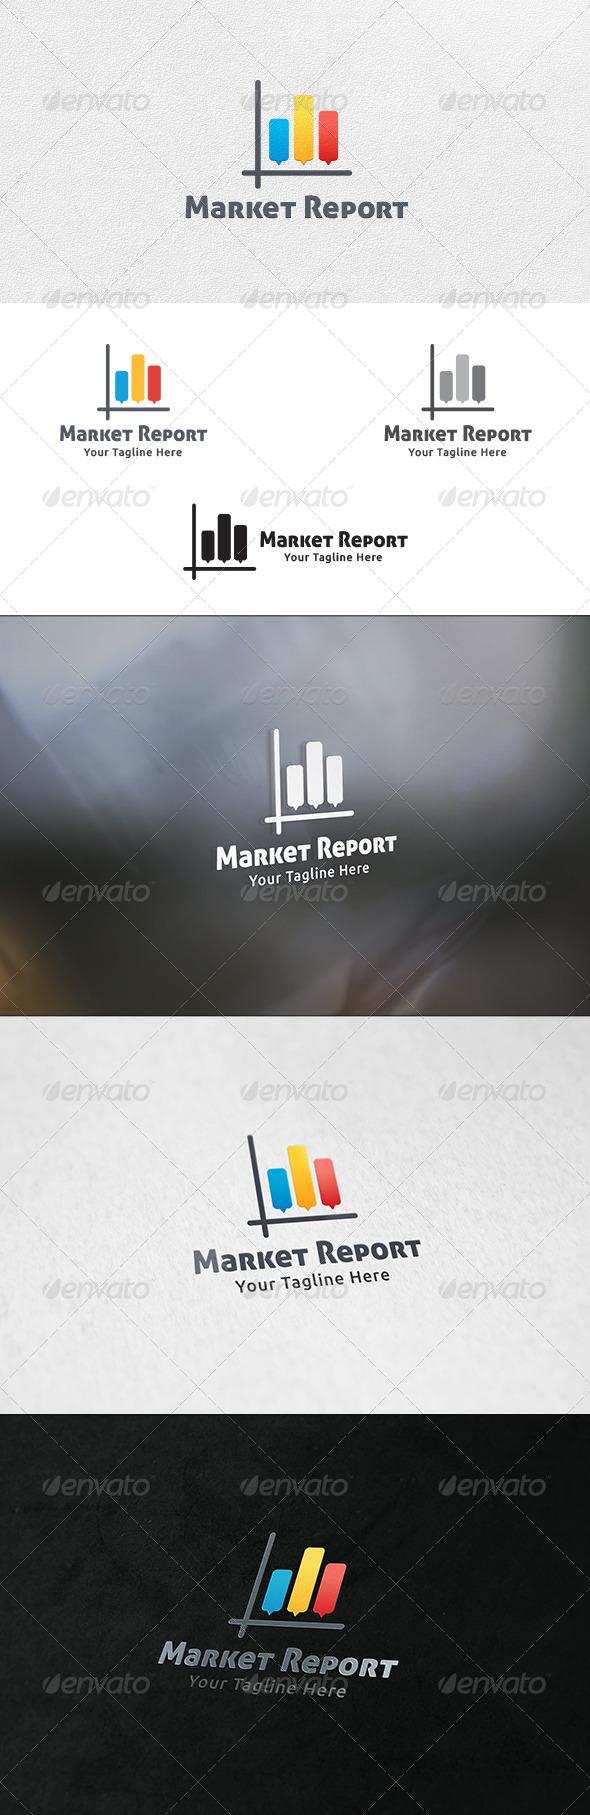 Market Report - Logo Template - Symbols Logo Templates